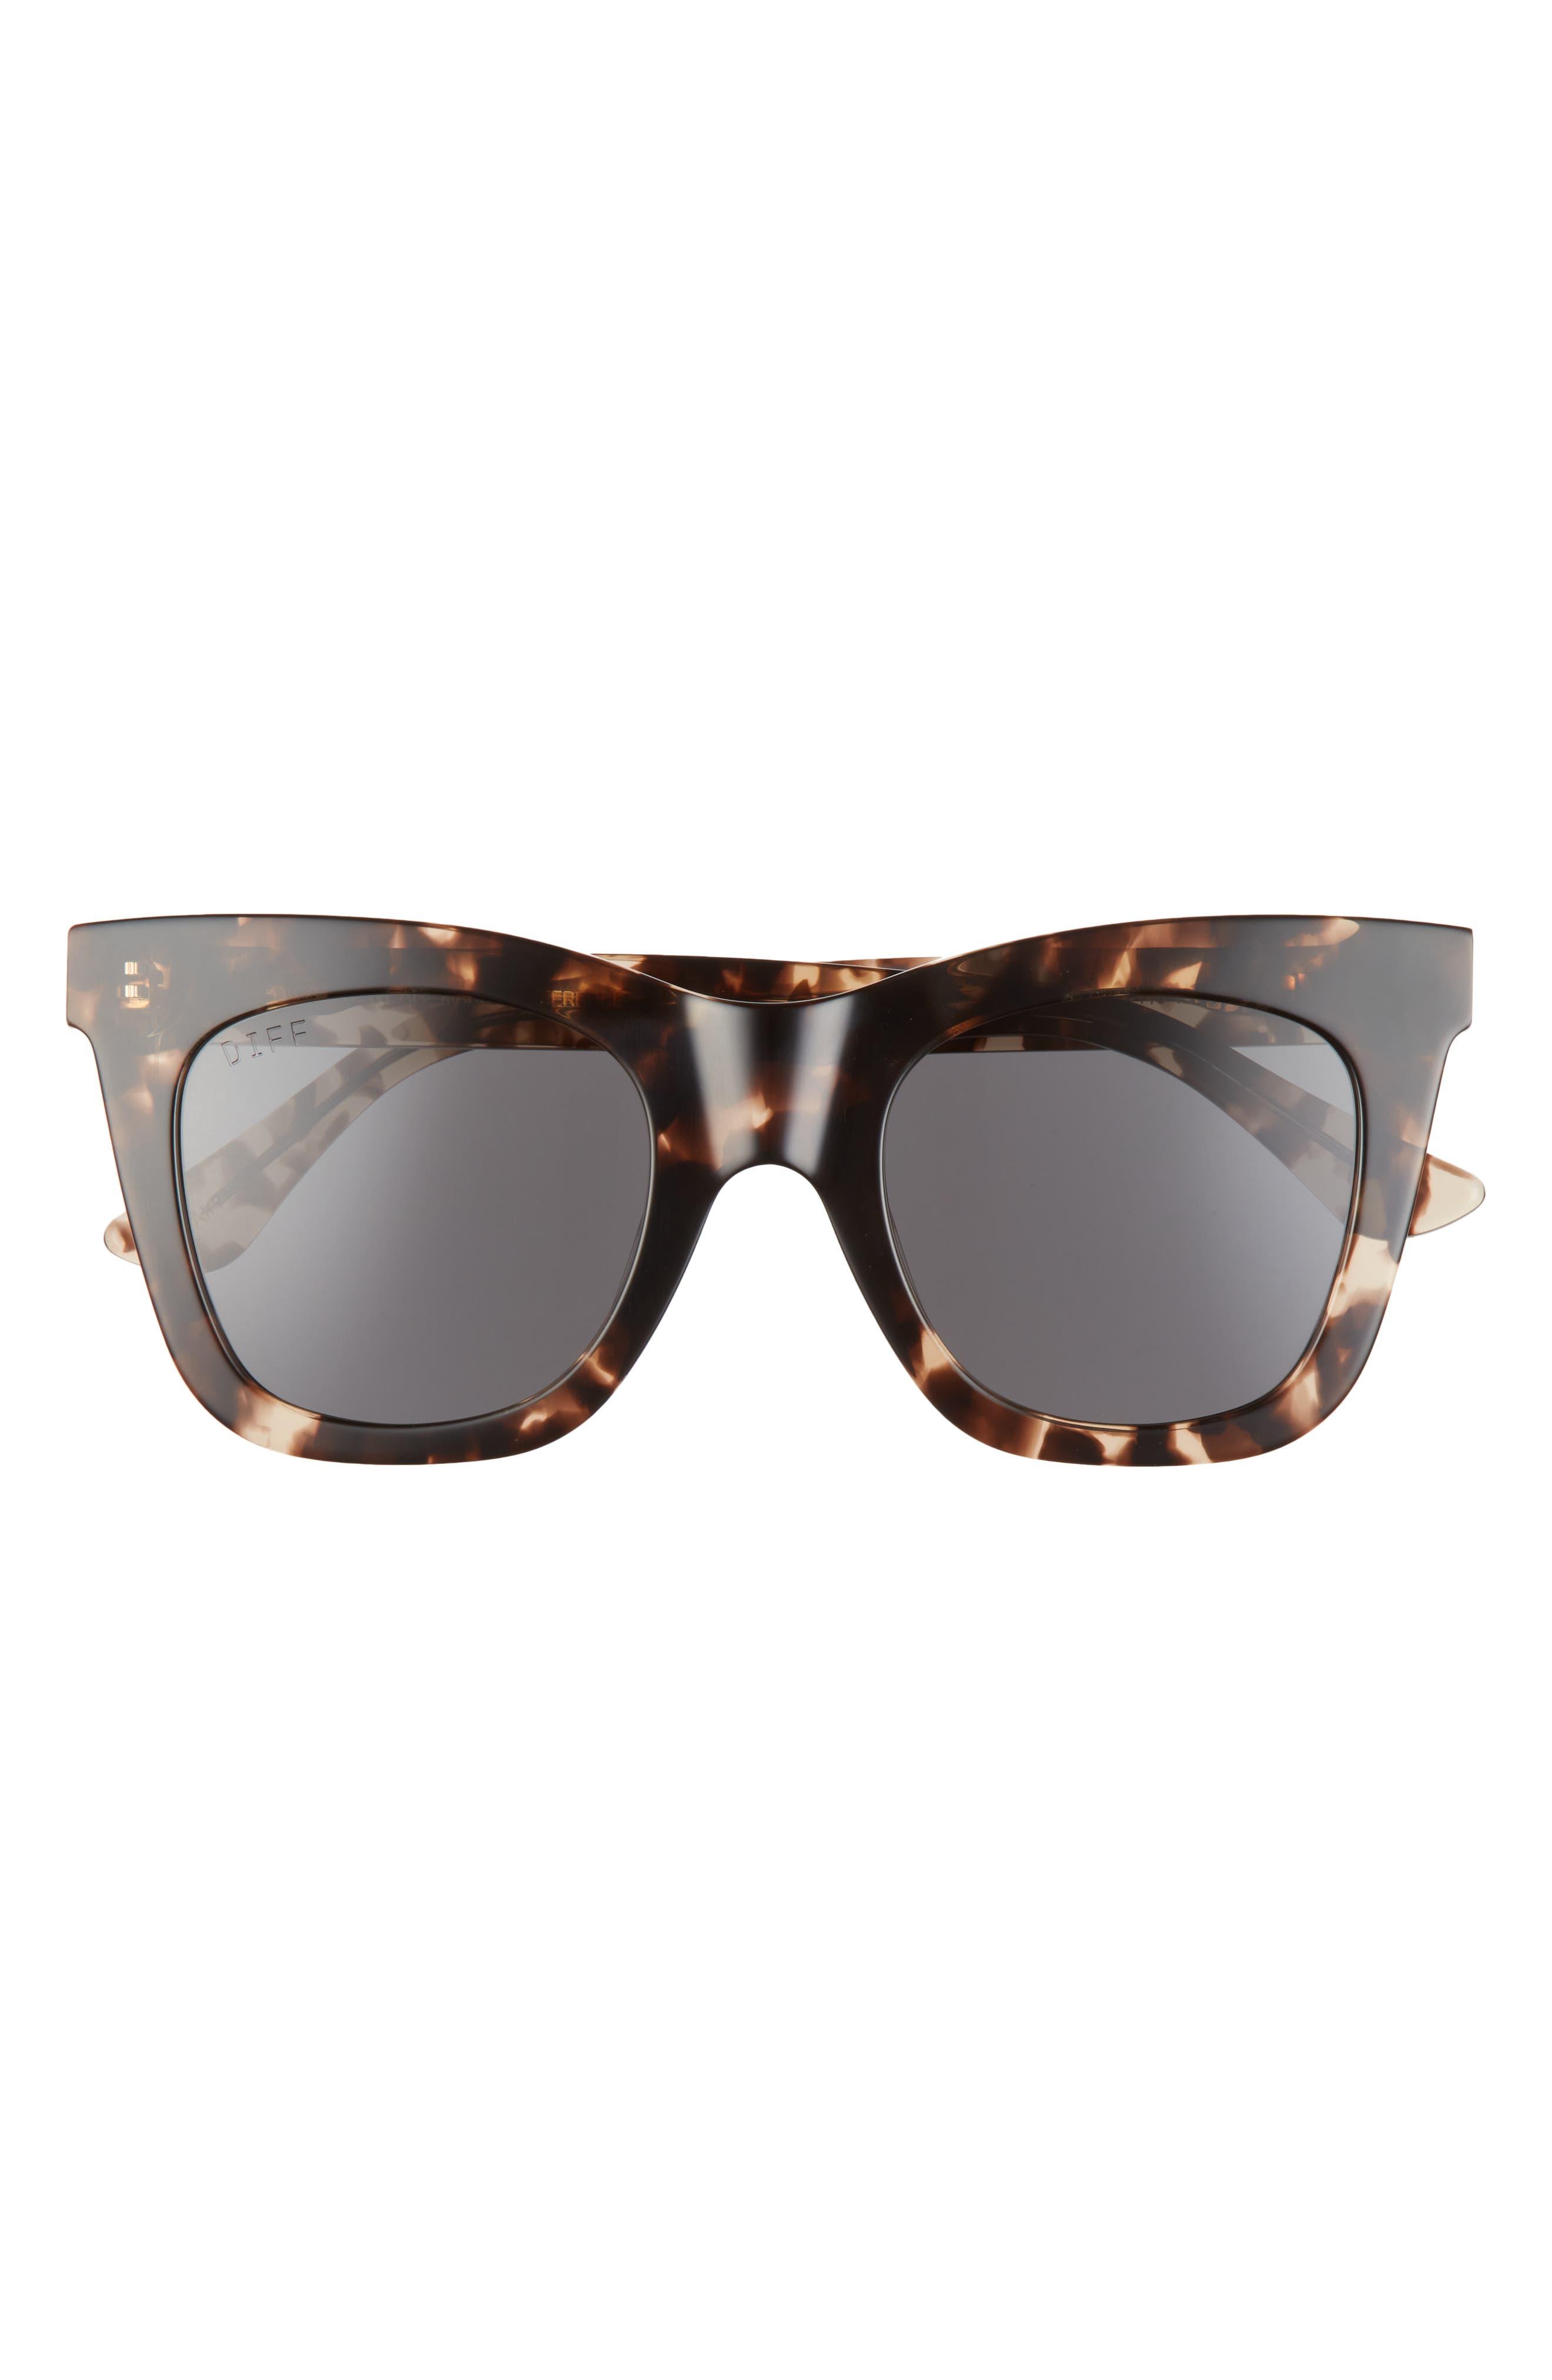 Kaia 50mm Polarized Cat Eye Sunglasses